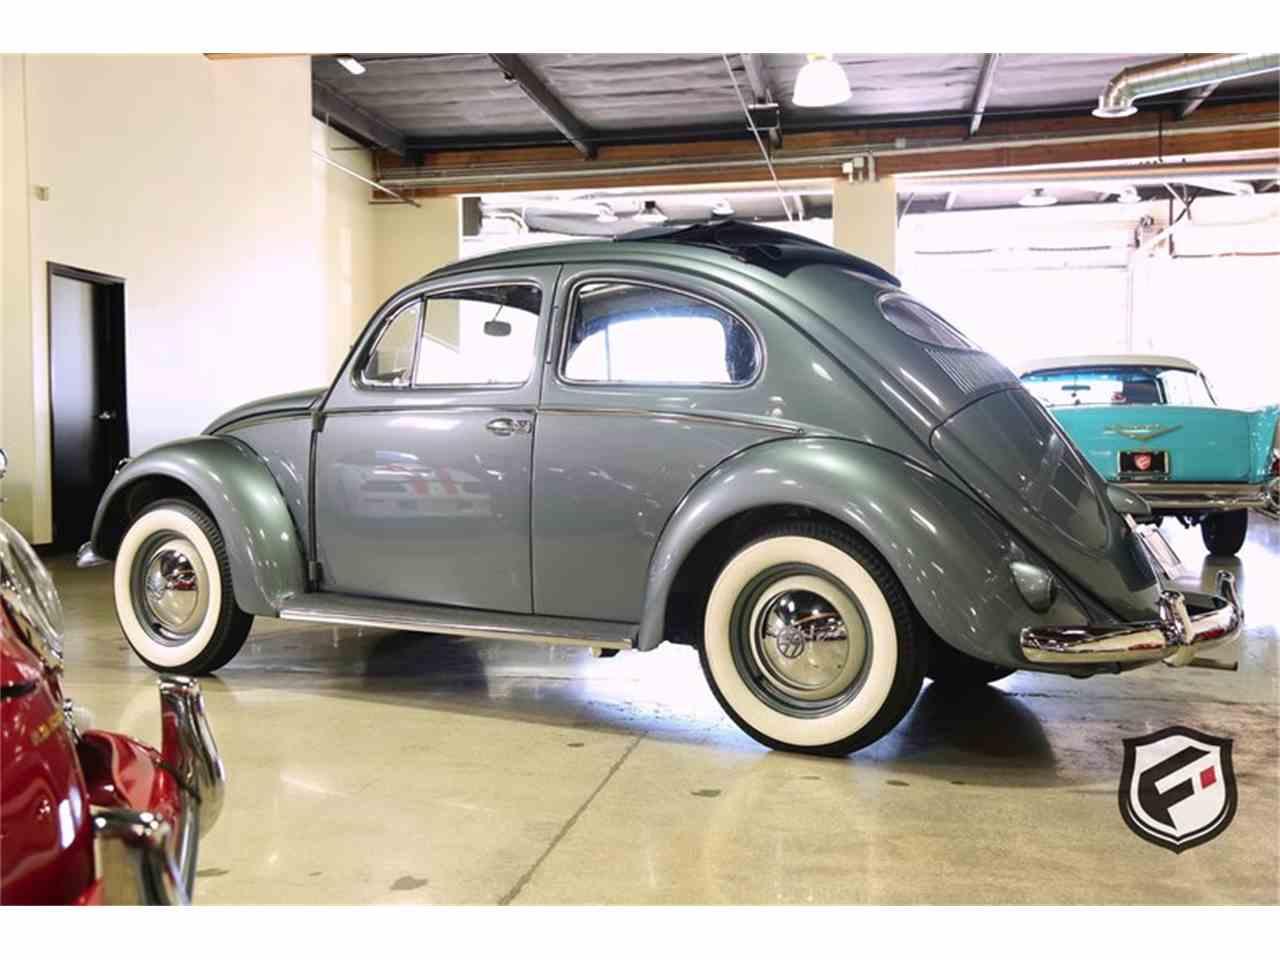 1954 Volkswagen Beetle For Sale Classiccars Com Cc 958060